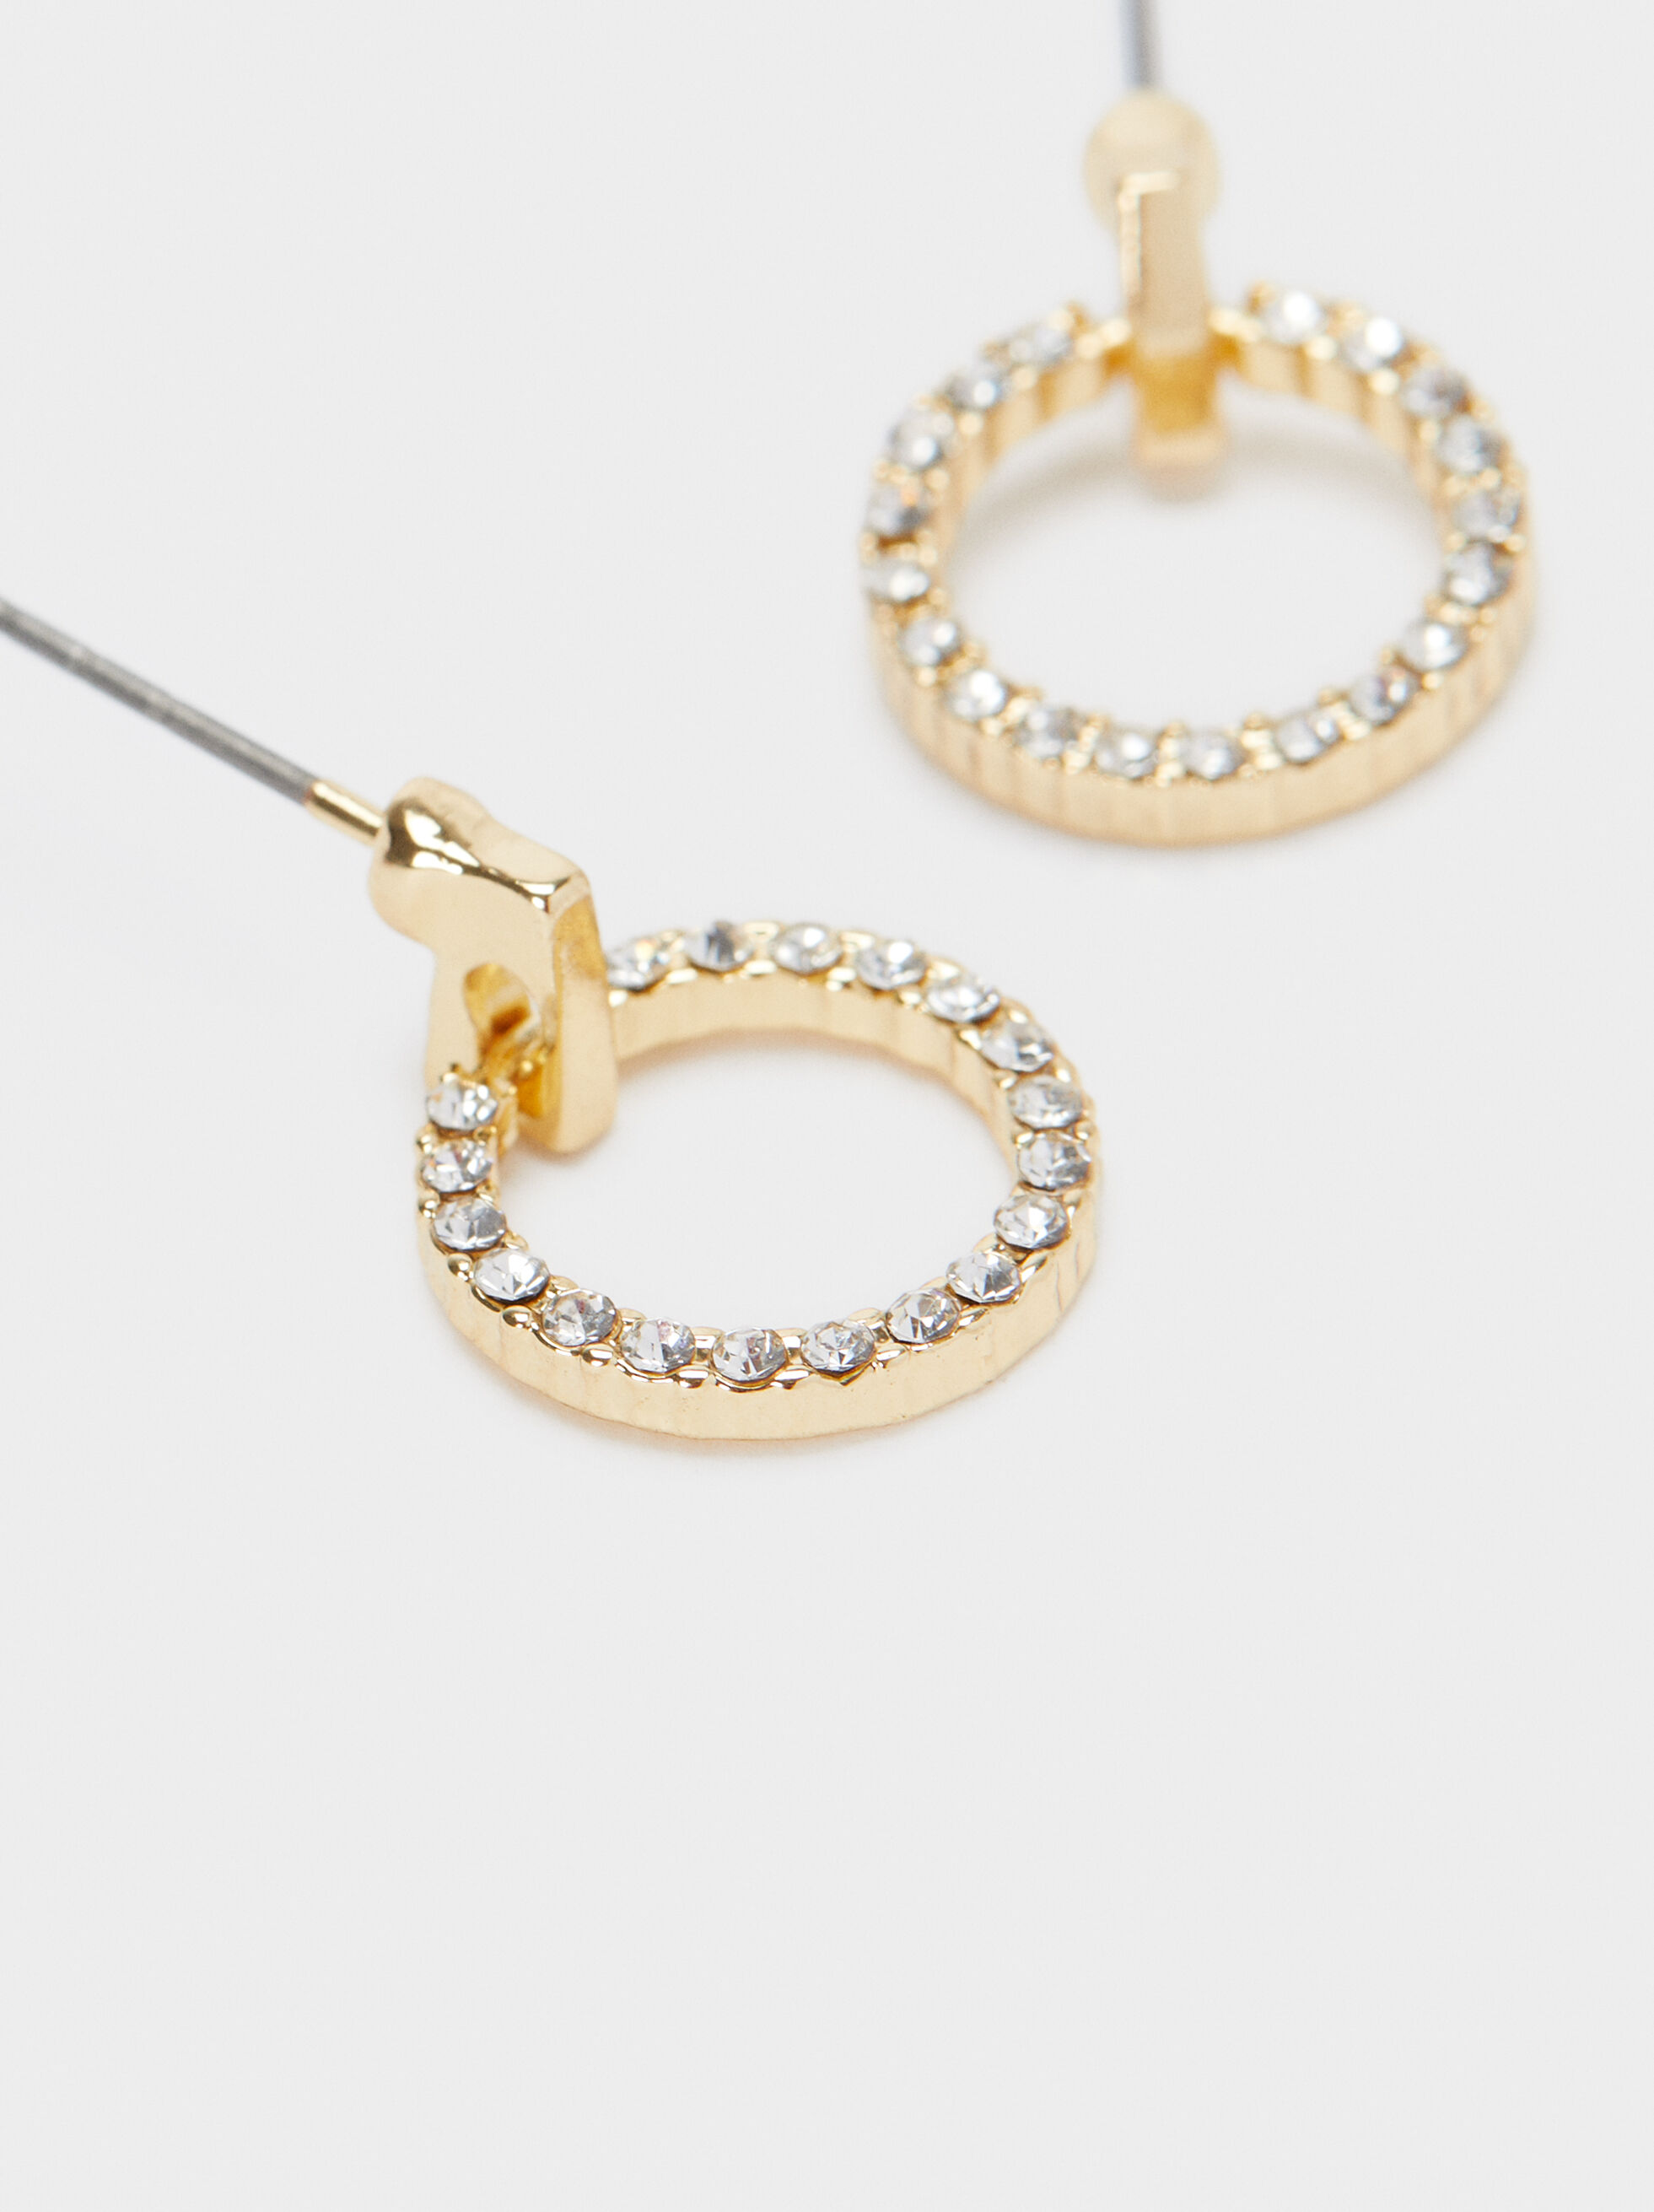 Short Dangle Earrings With Rhinestones, Golden, hi-res